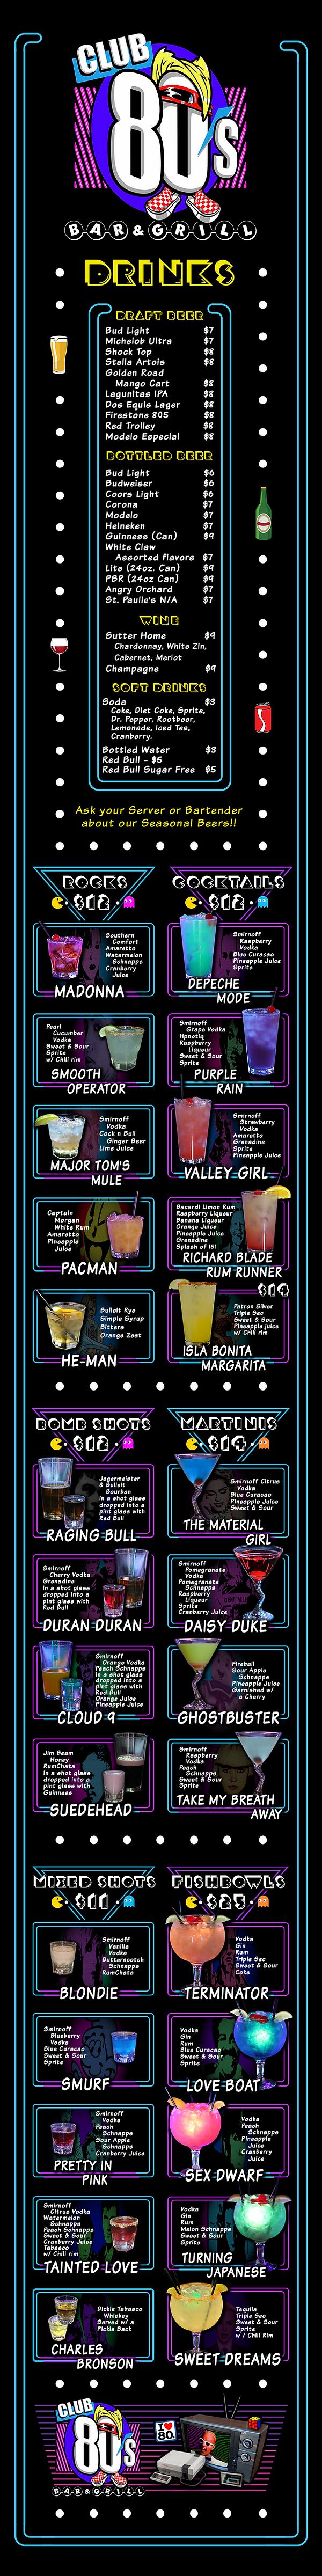 Corona Web Menu MOBILE DRINKS 10_2020.pn